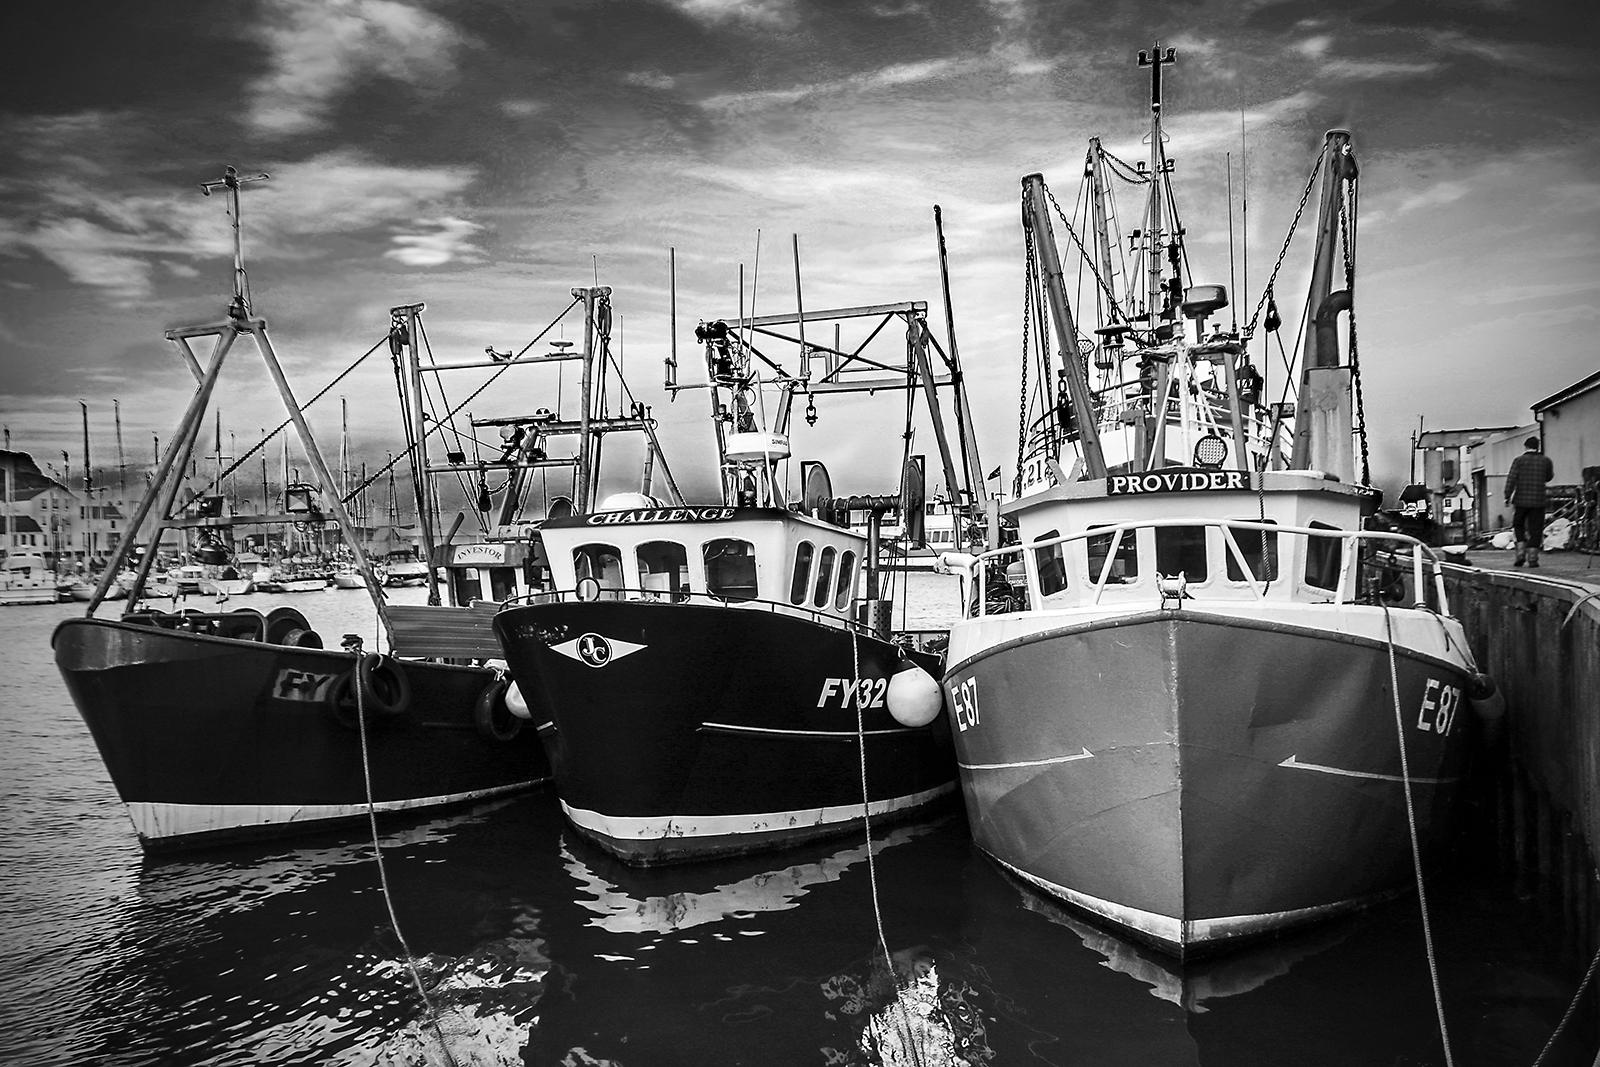 Moody Harbour